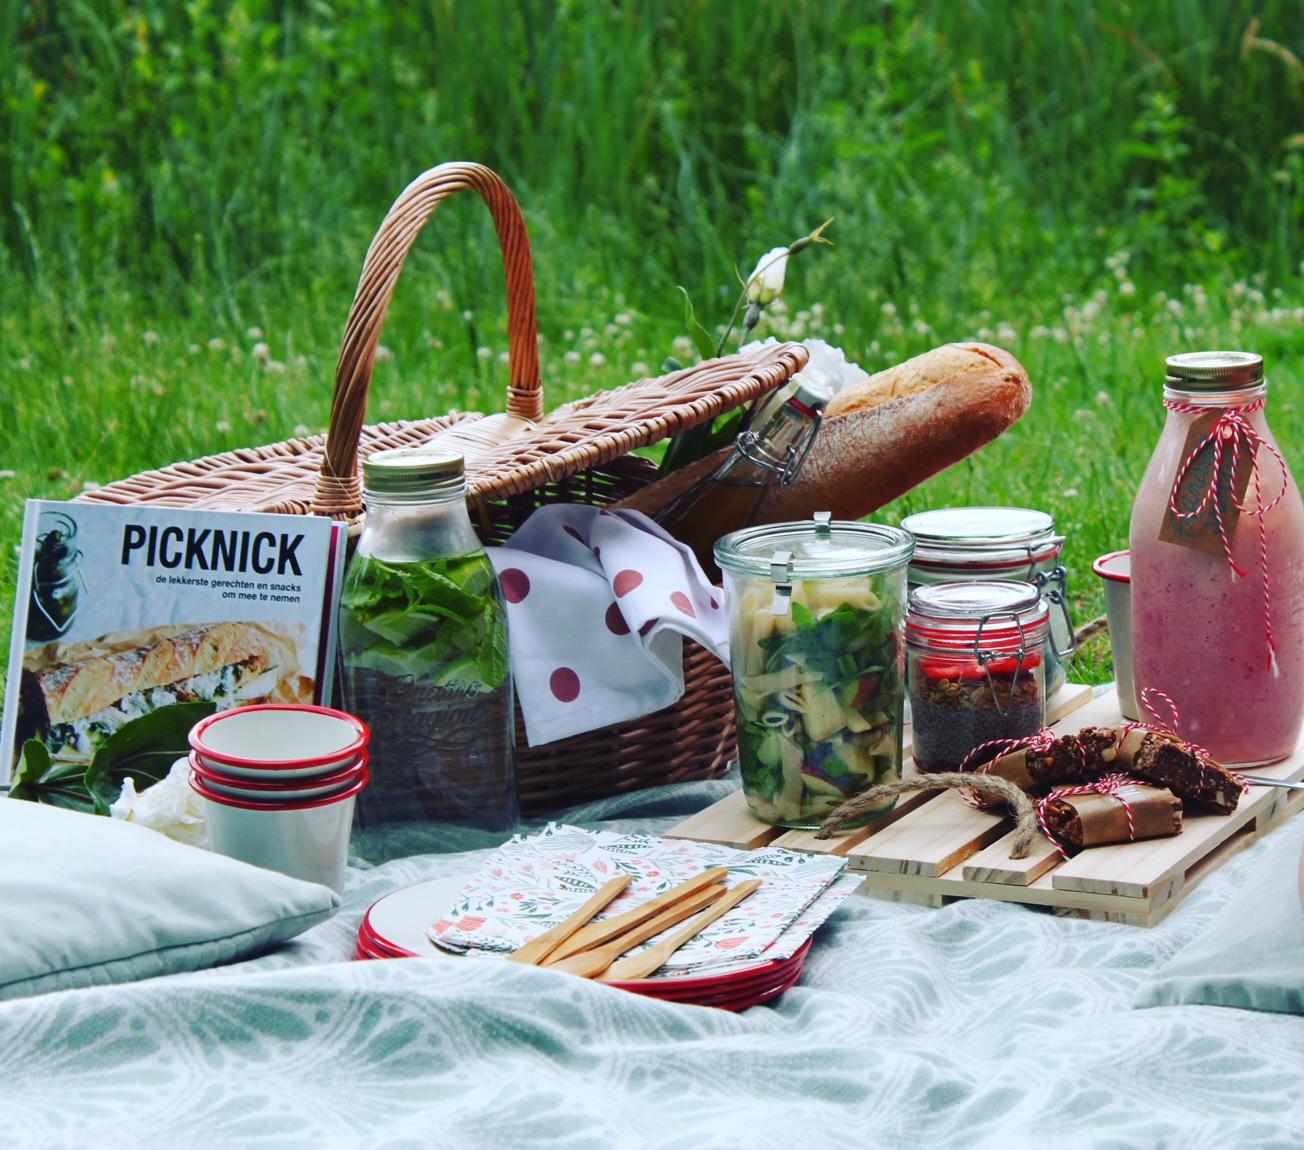 wat in picknickmand